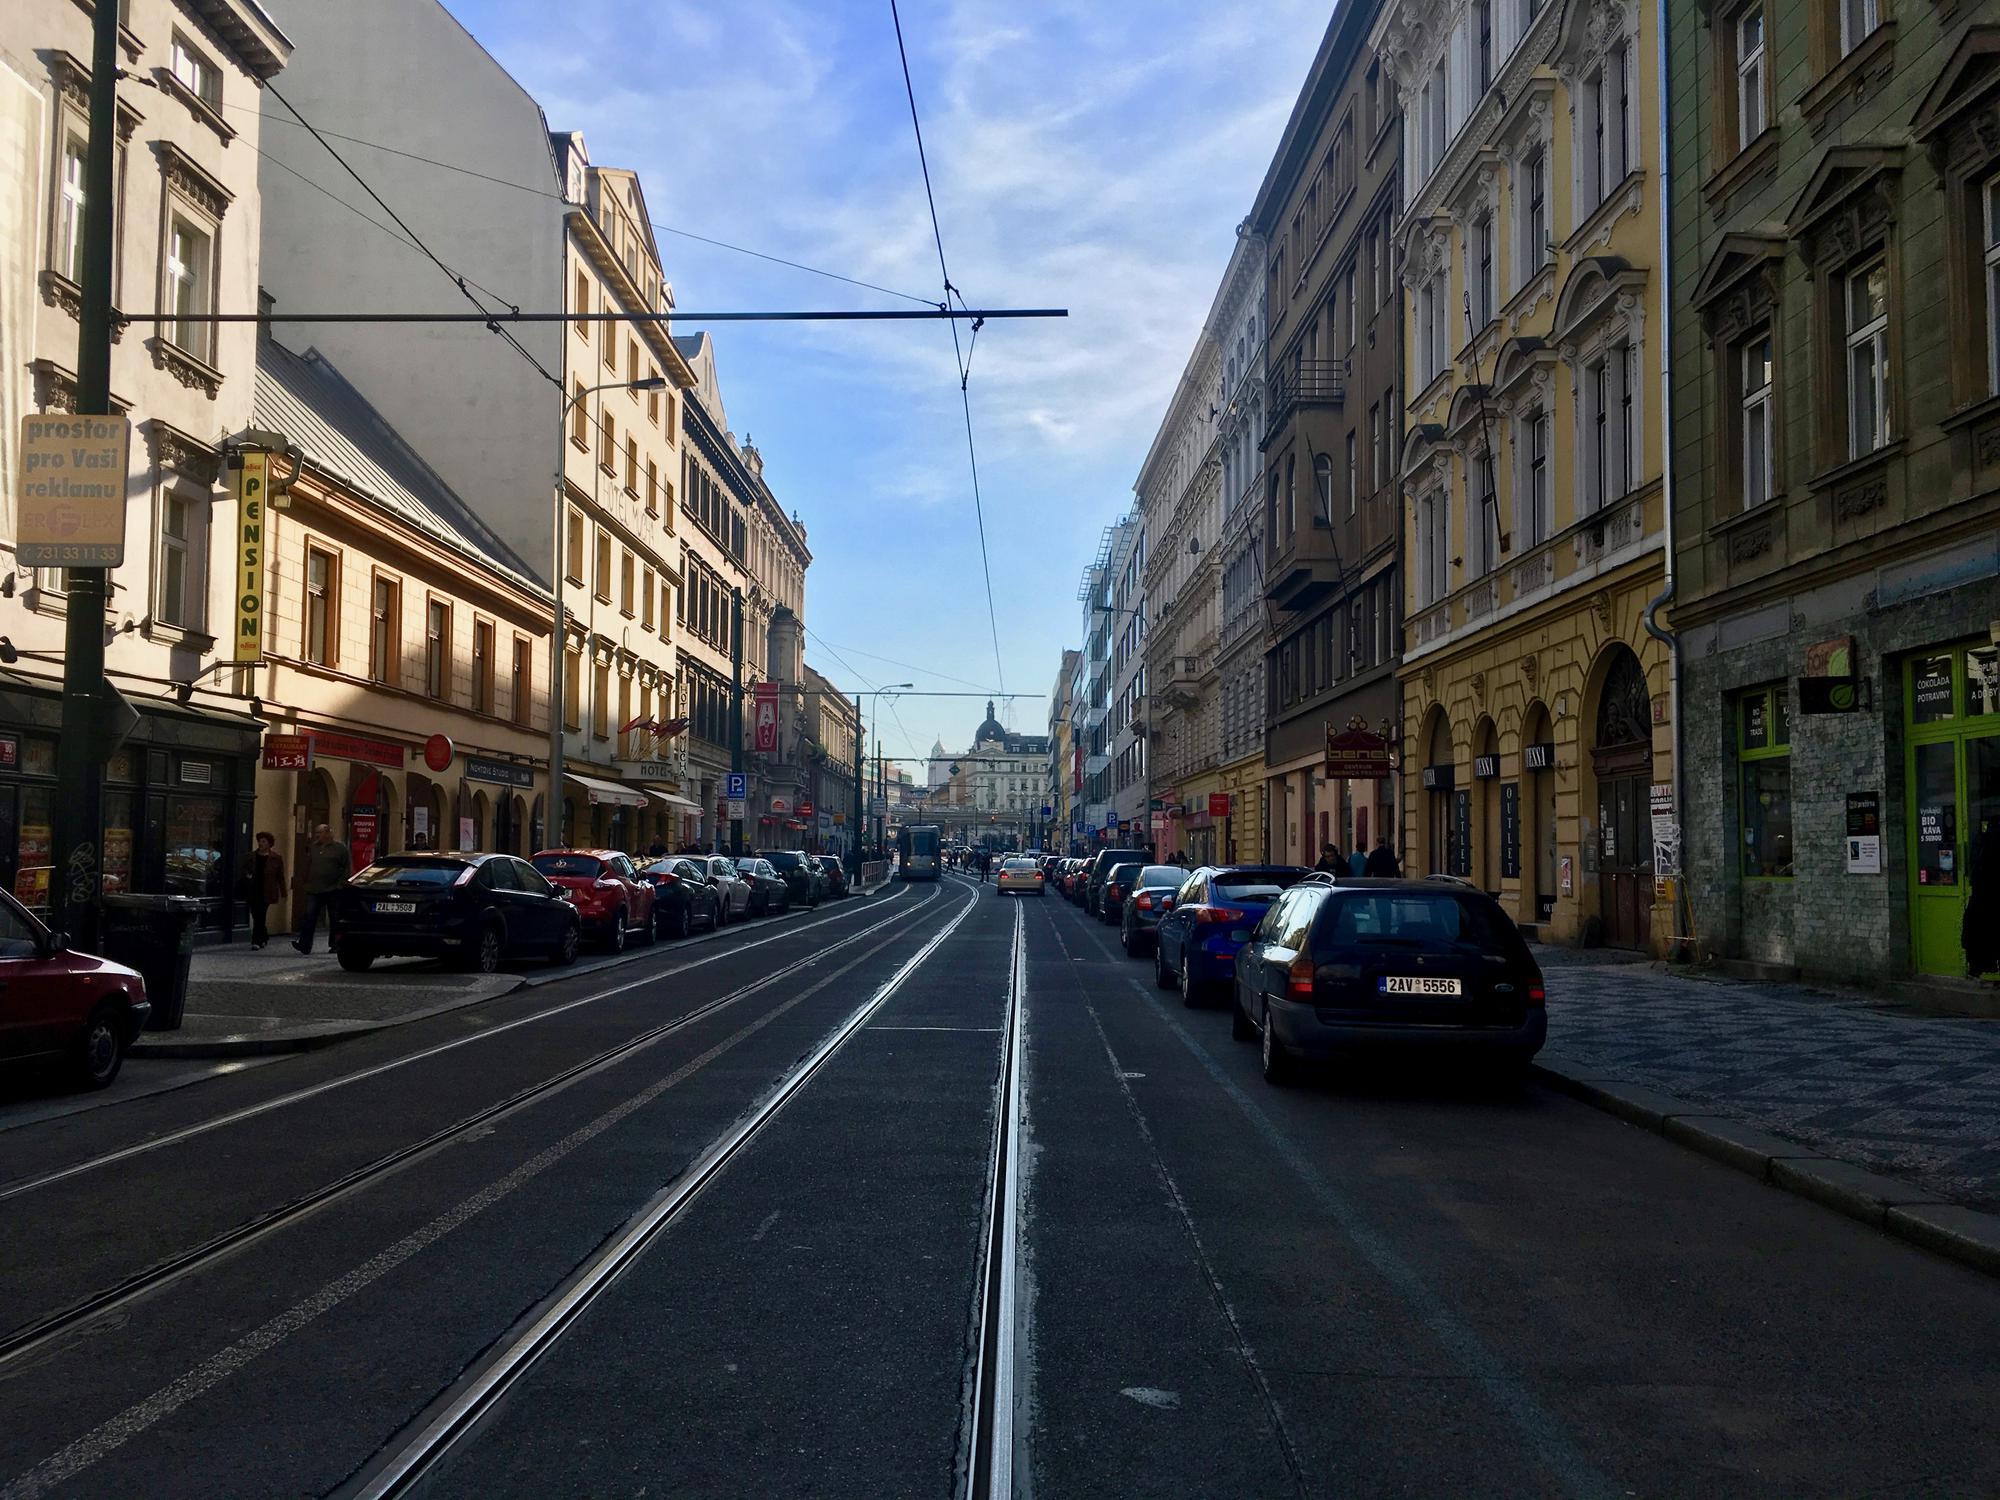 🇨🇿 Прага, Чехия, май 2017.